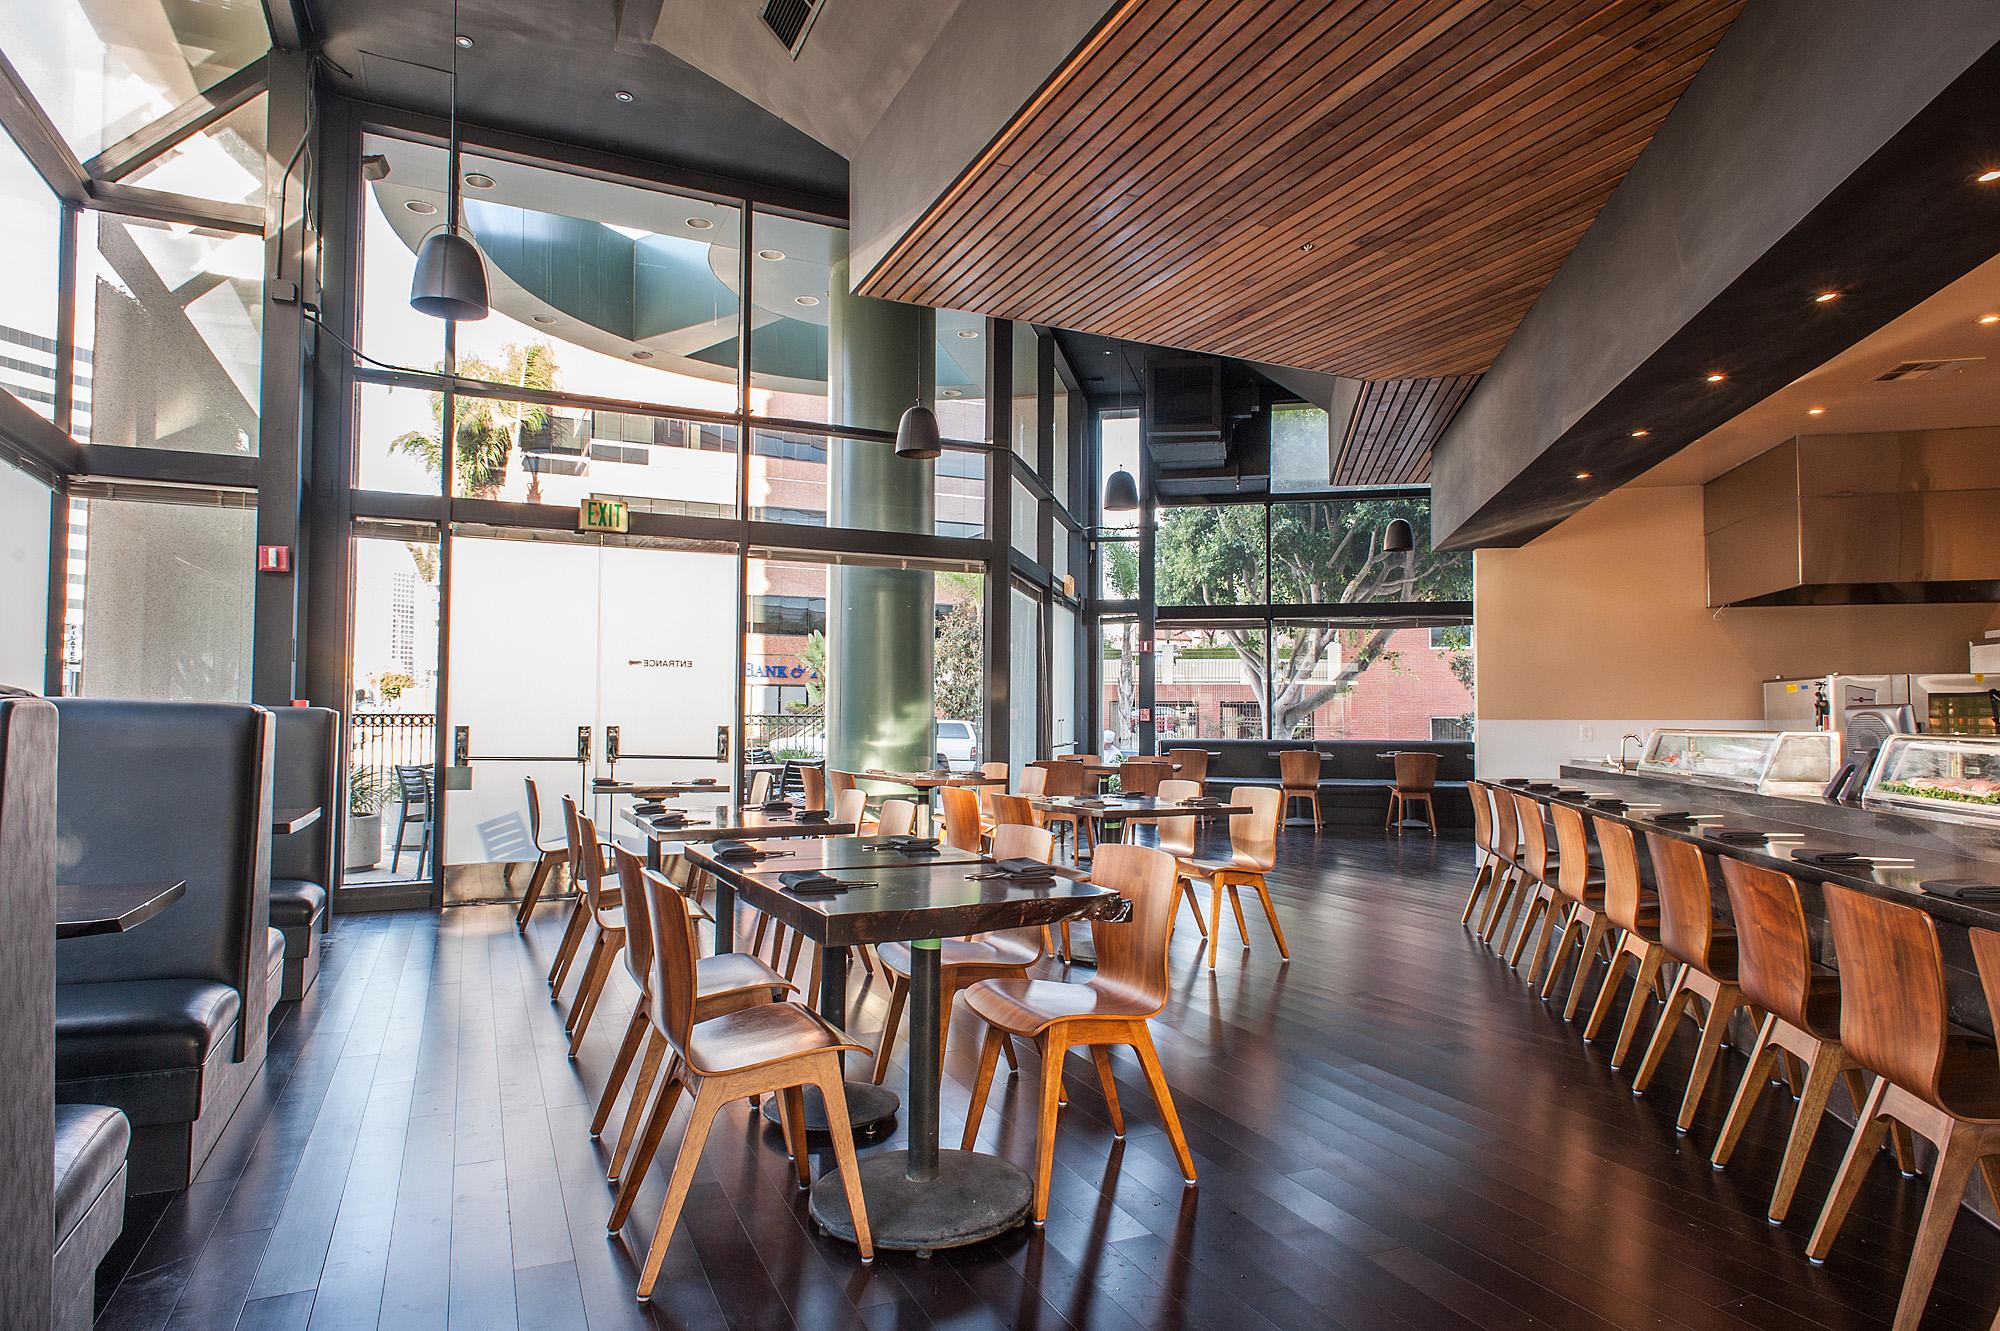 Brunch Hit Blu Jam Cafe Just Opened A Giant New Westside Location